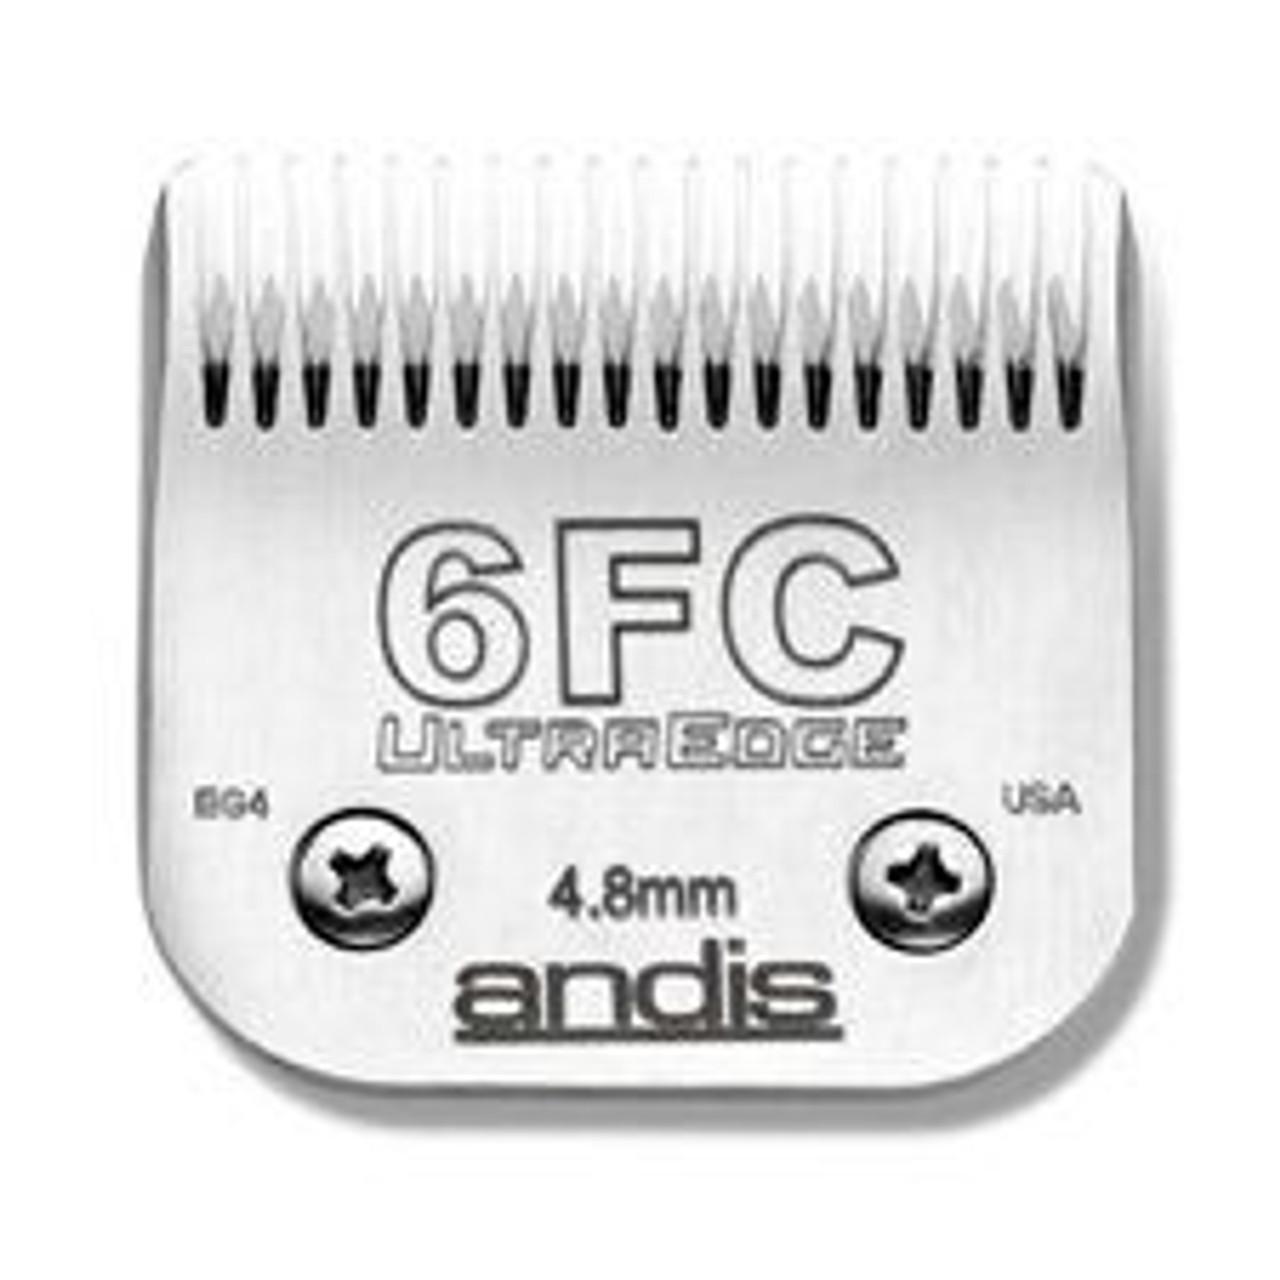 Andis Ultra Edge #6FC Blade